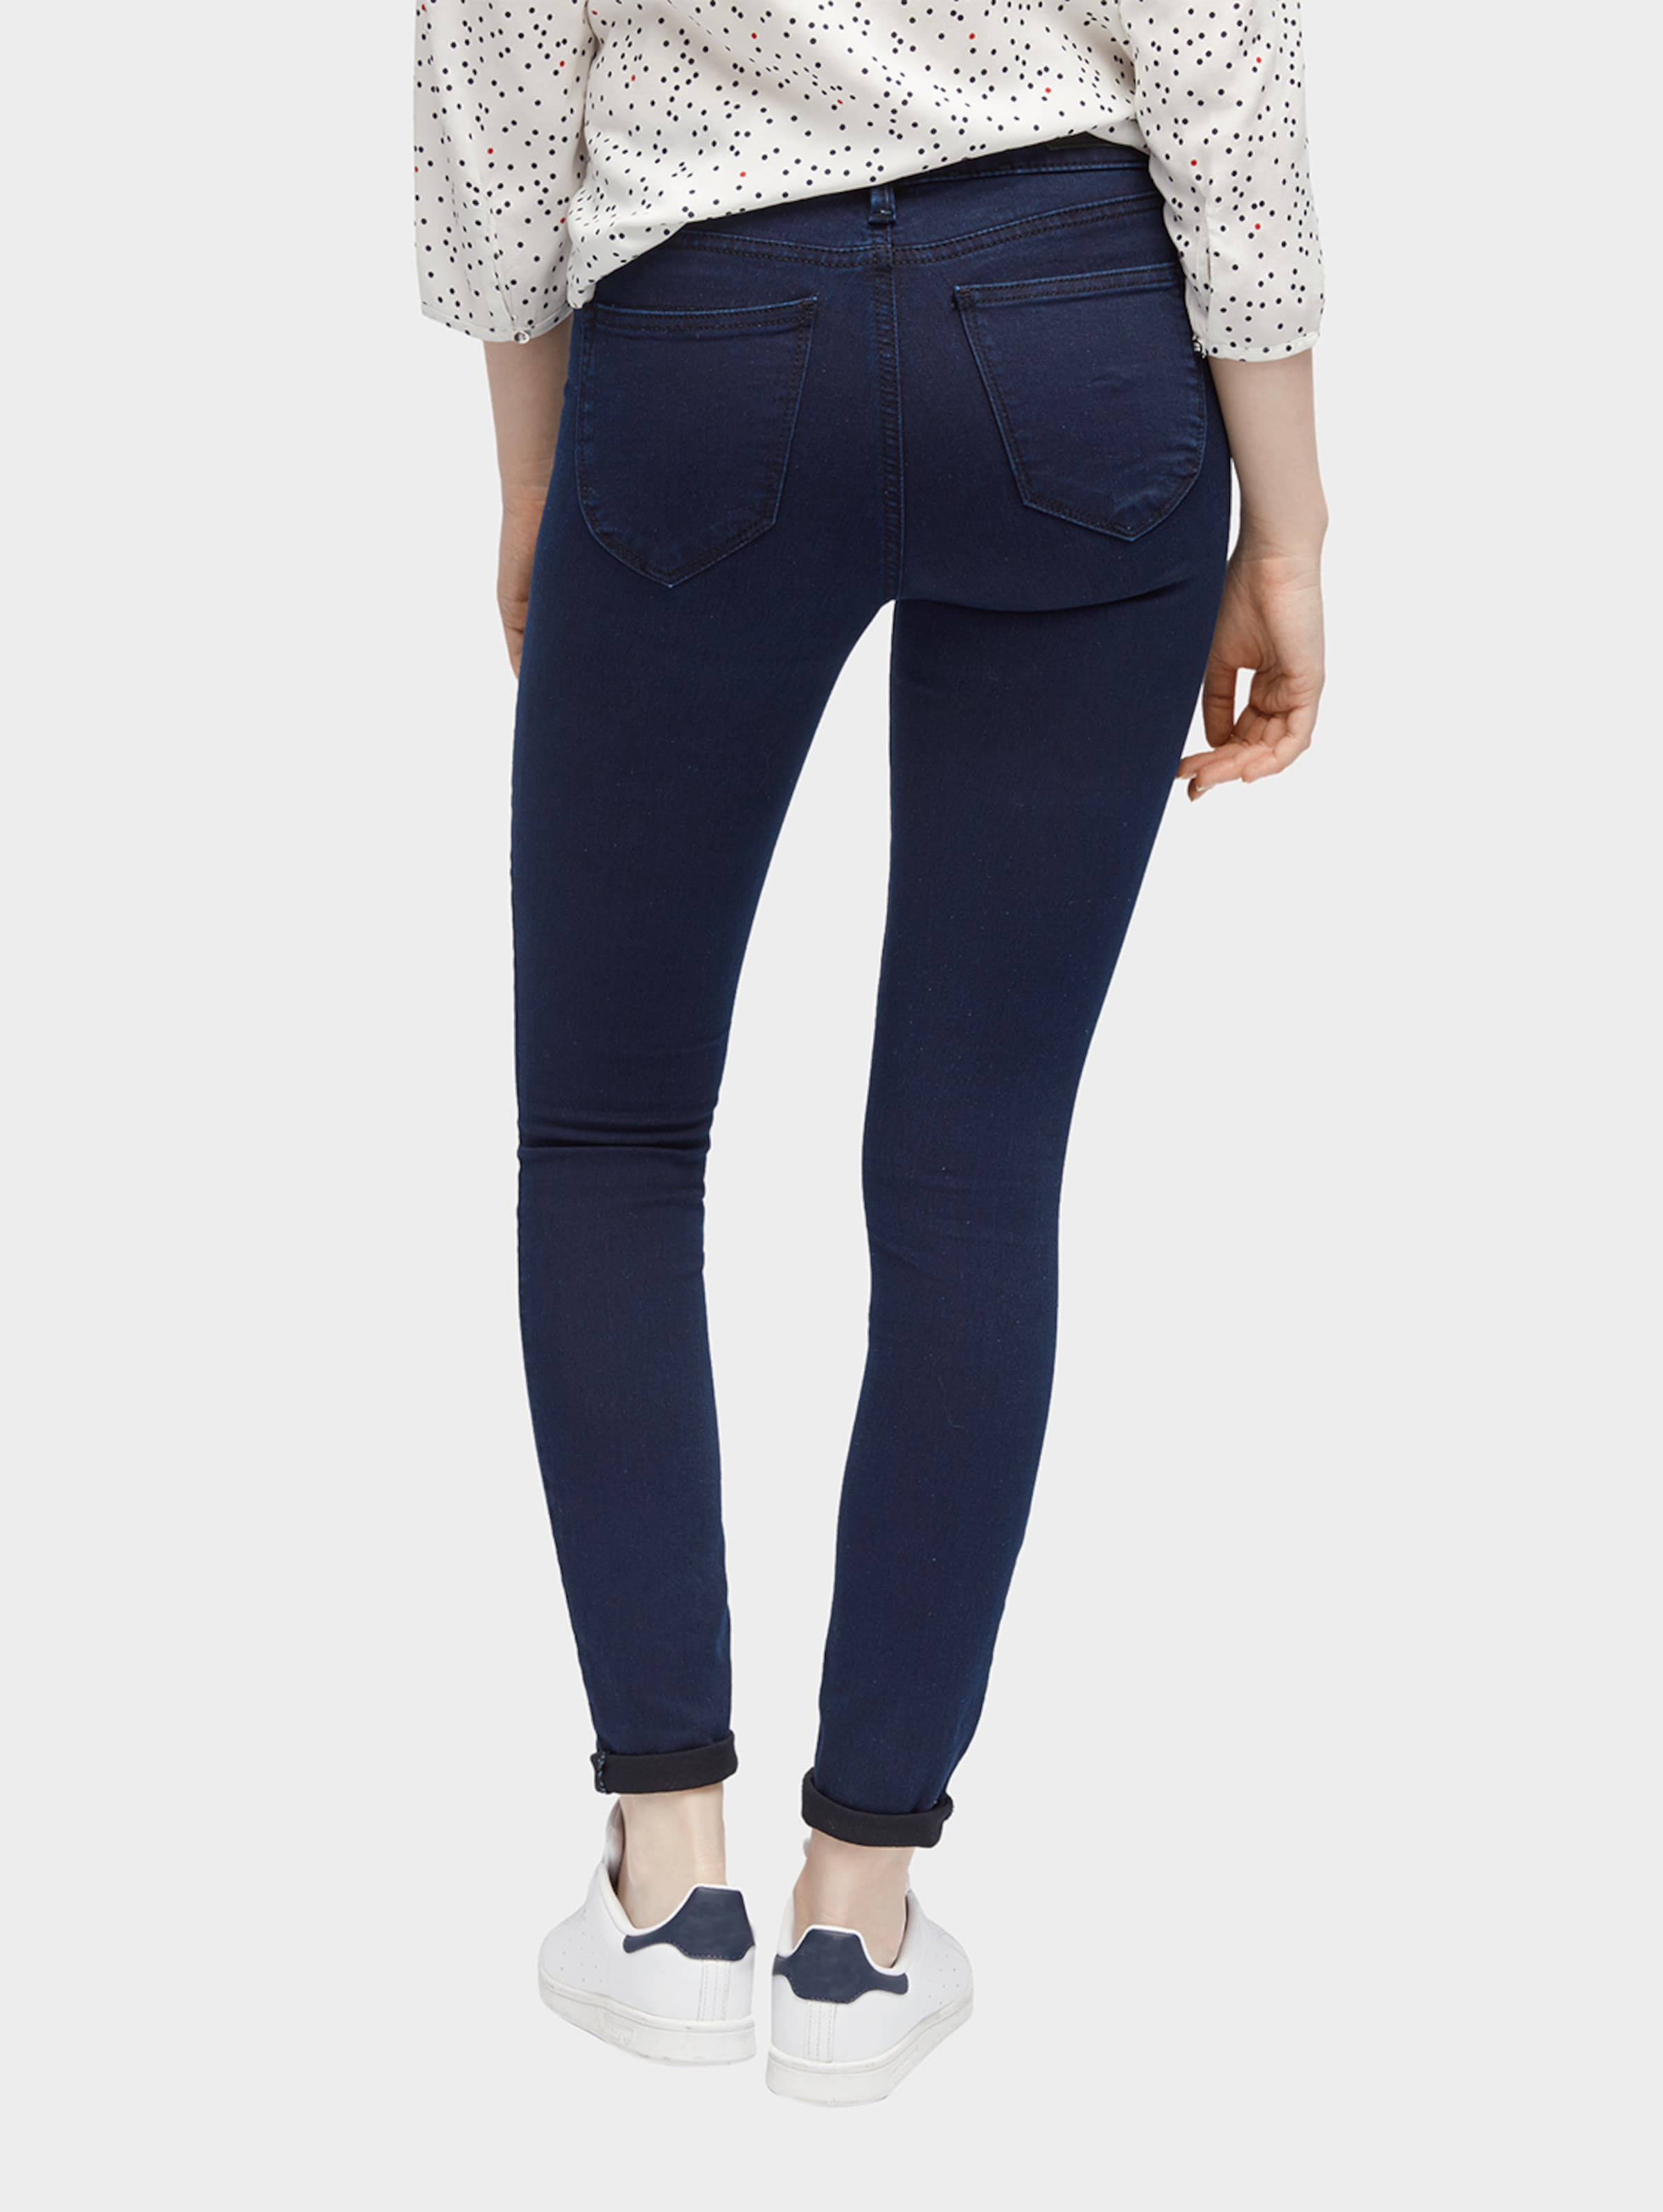 TOM TAILOR DENIM Extra Skinny Jeans 'Nela' Rabatt 2018 Rabatt Online-Shopping Bequem Online Auslassstellen Günstiger Preis Fachlich BQbfD